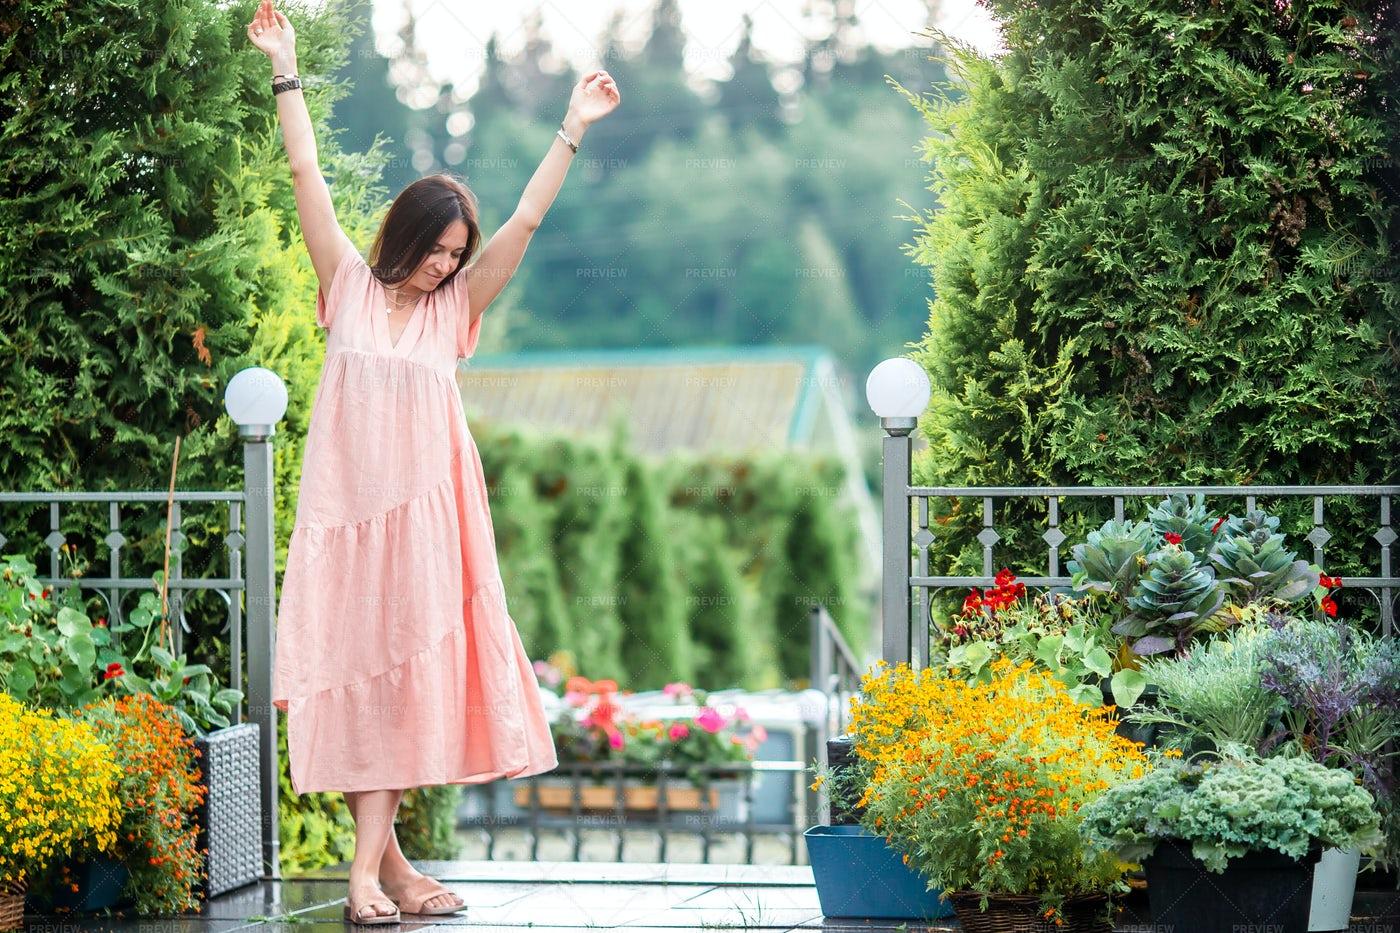 Happy Woman In A Flower Garden: Stock Photos